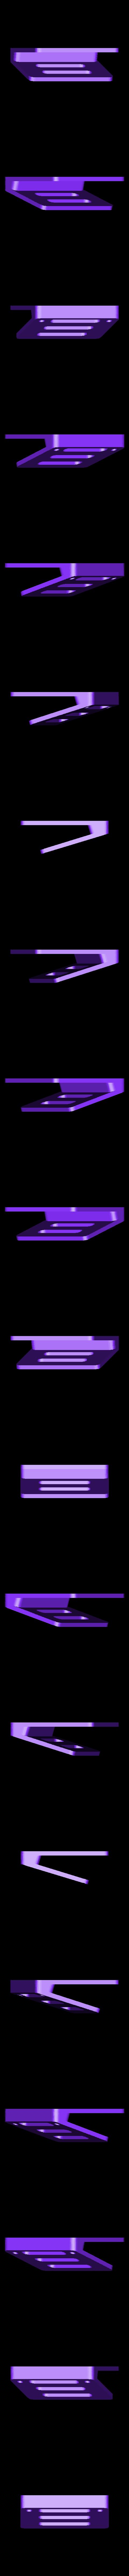 Laptop_Monitor_Mount_-_Vesa_100.stl Download free STL file Monitor Laptop Stand - Vesa Mount 100 & 75 • 3D printer object, FedorSosnin